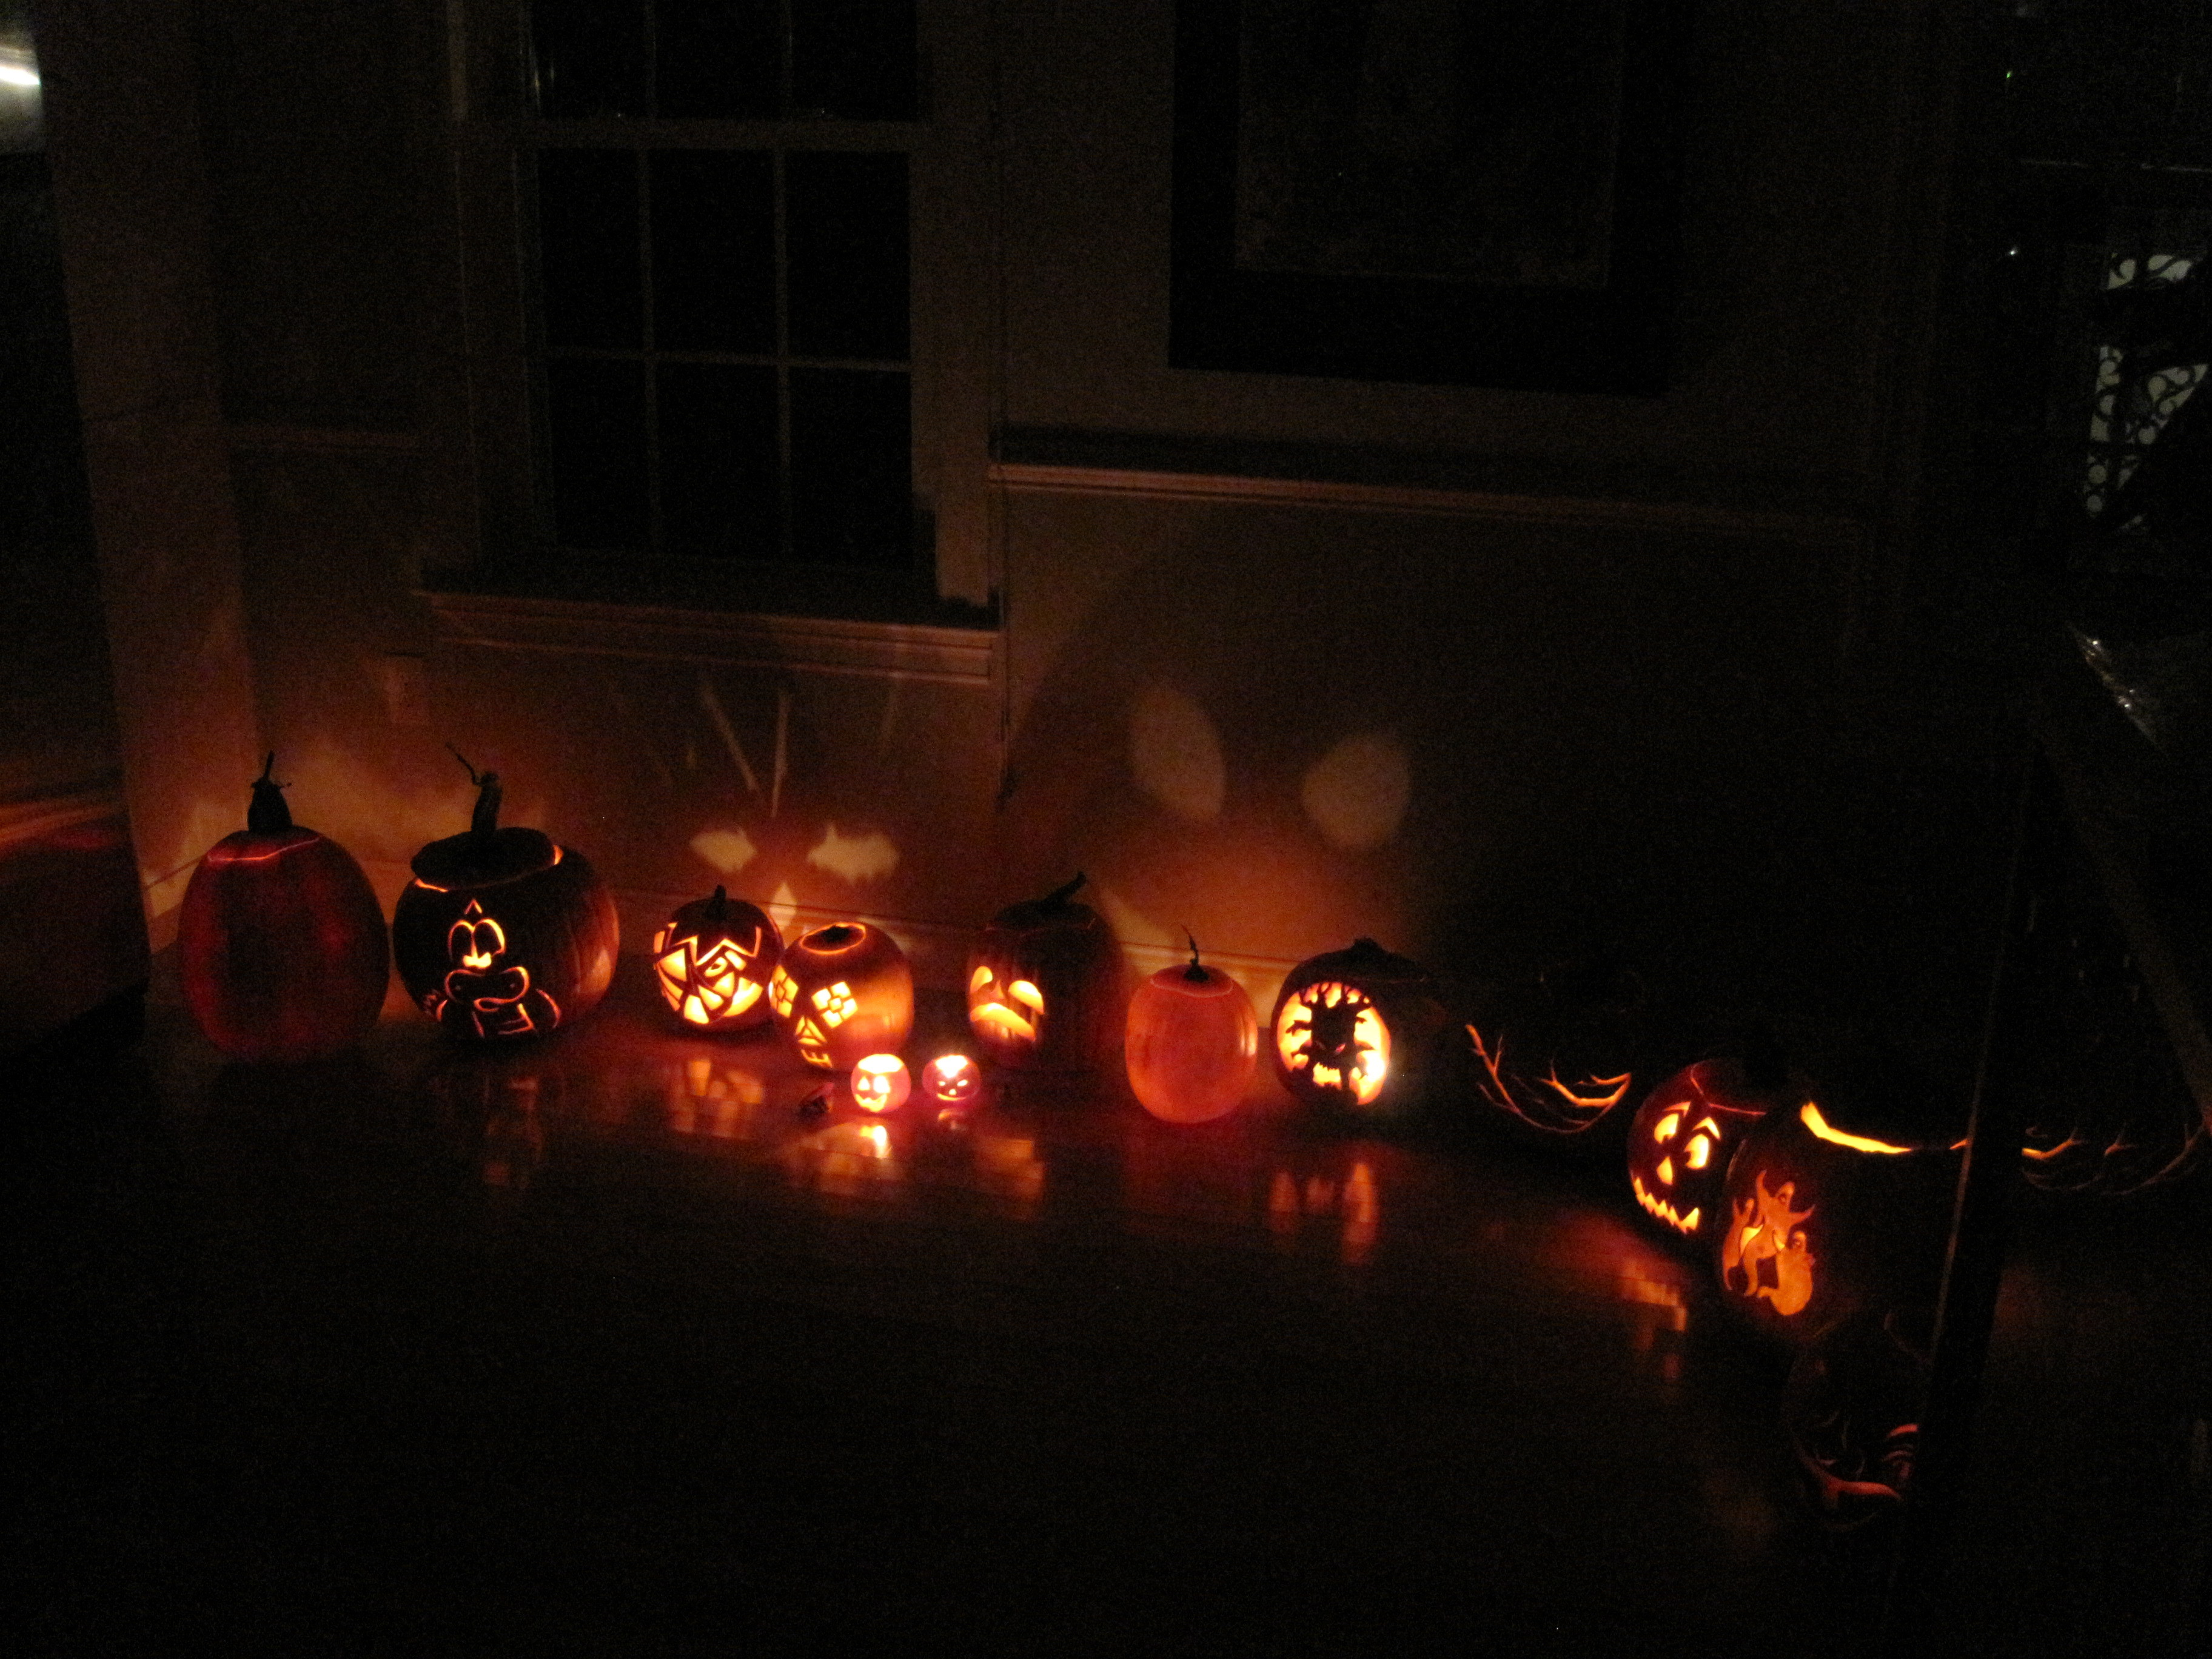 Celebrations Occasions Halloween Creepy Props Skeleton Bar Decoration Halloween Party Events Suppl Lduk Kisetsu System Co Jp